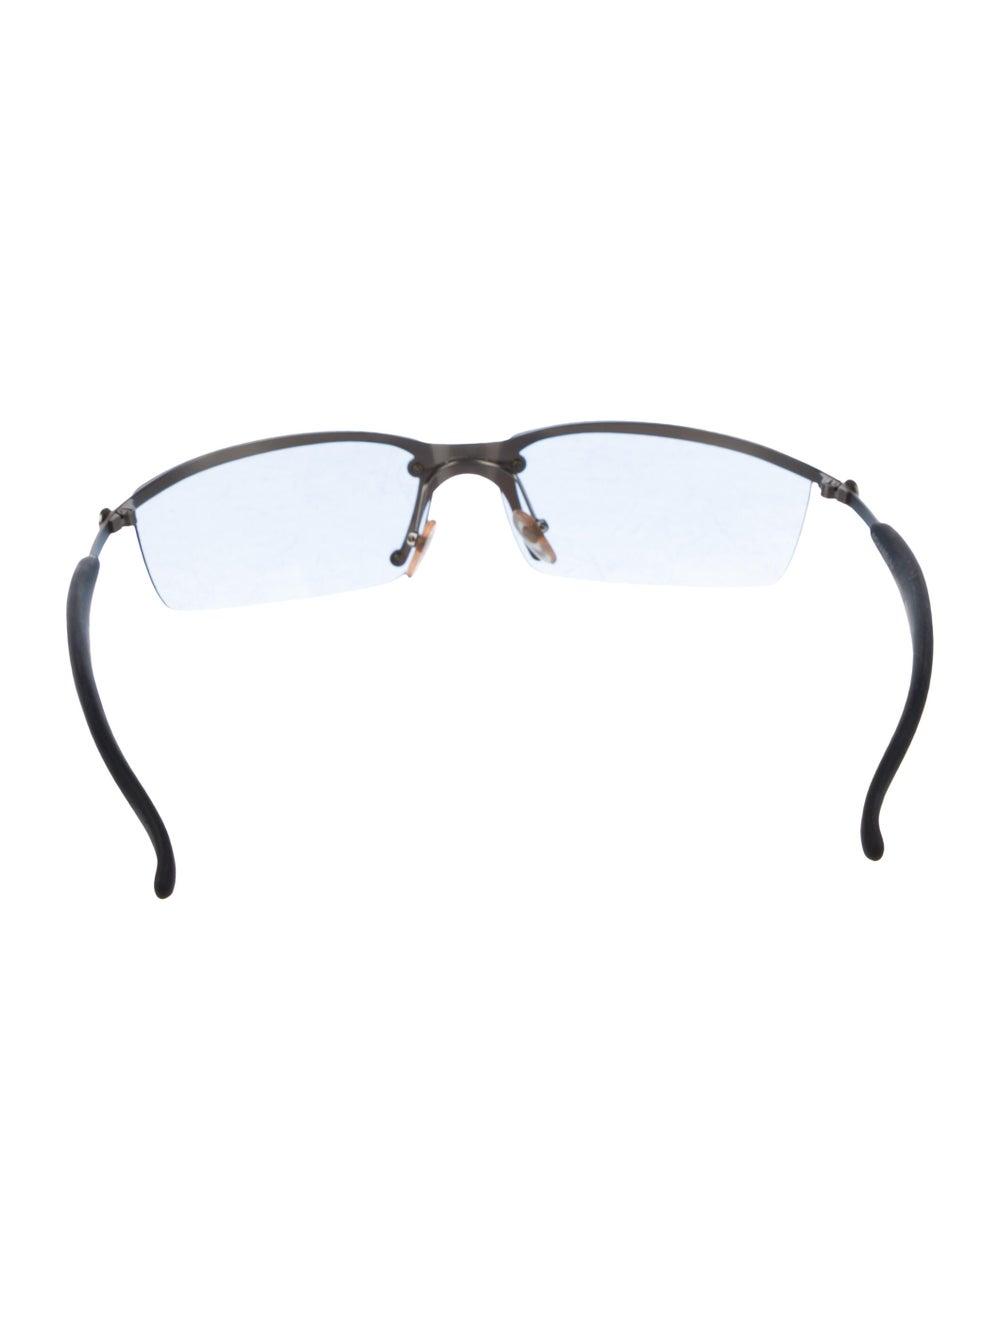 Chanel Rimless CC Sunglasses Grey - image 3